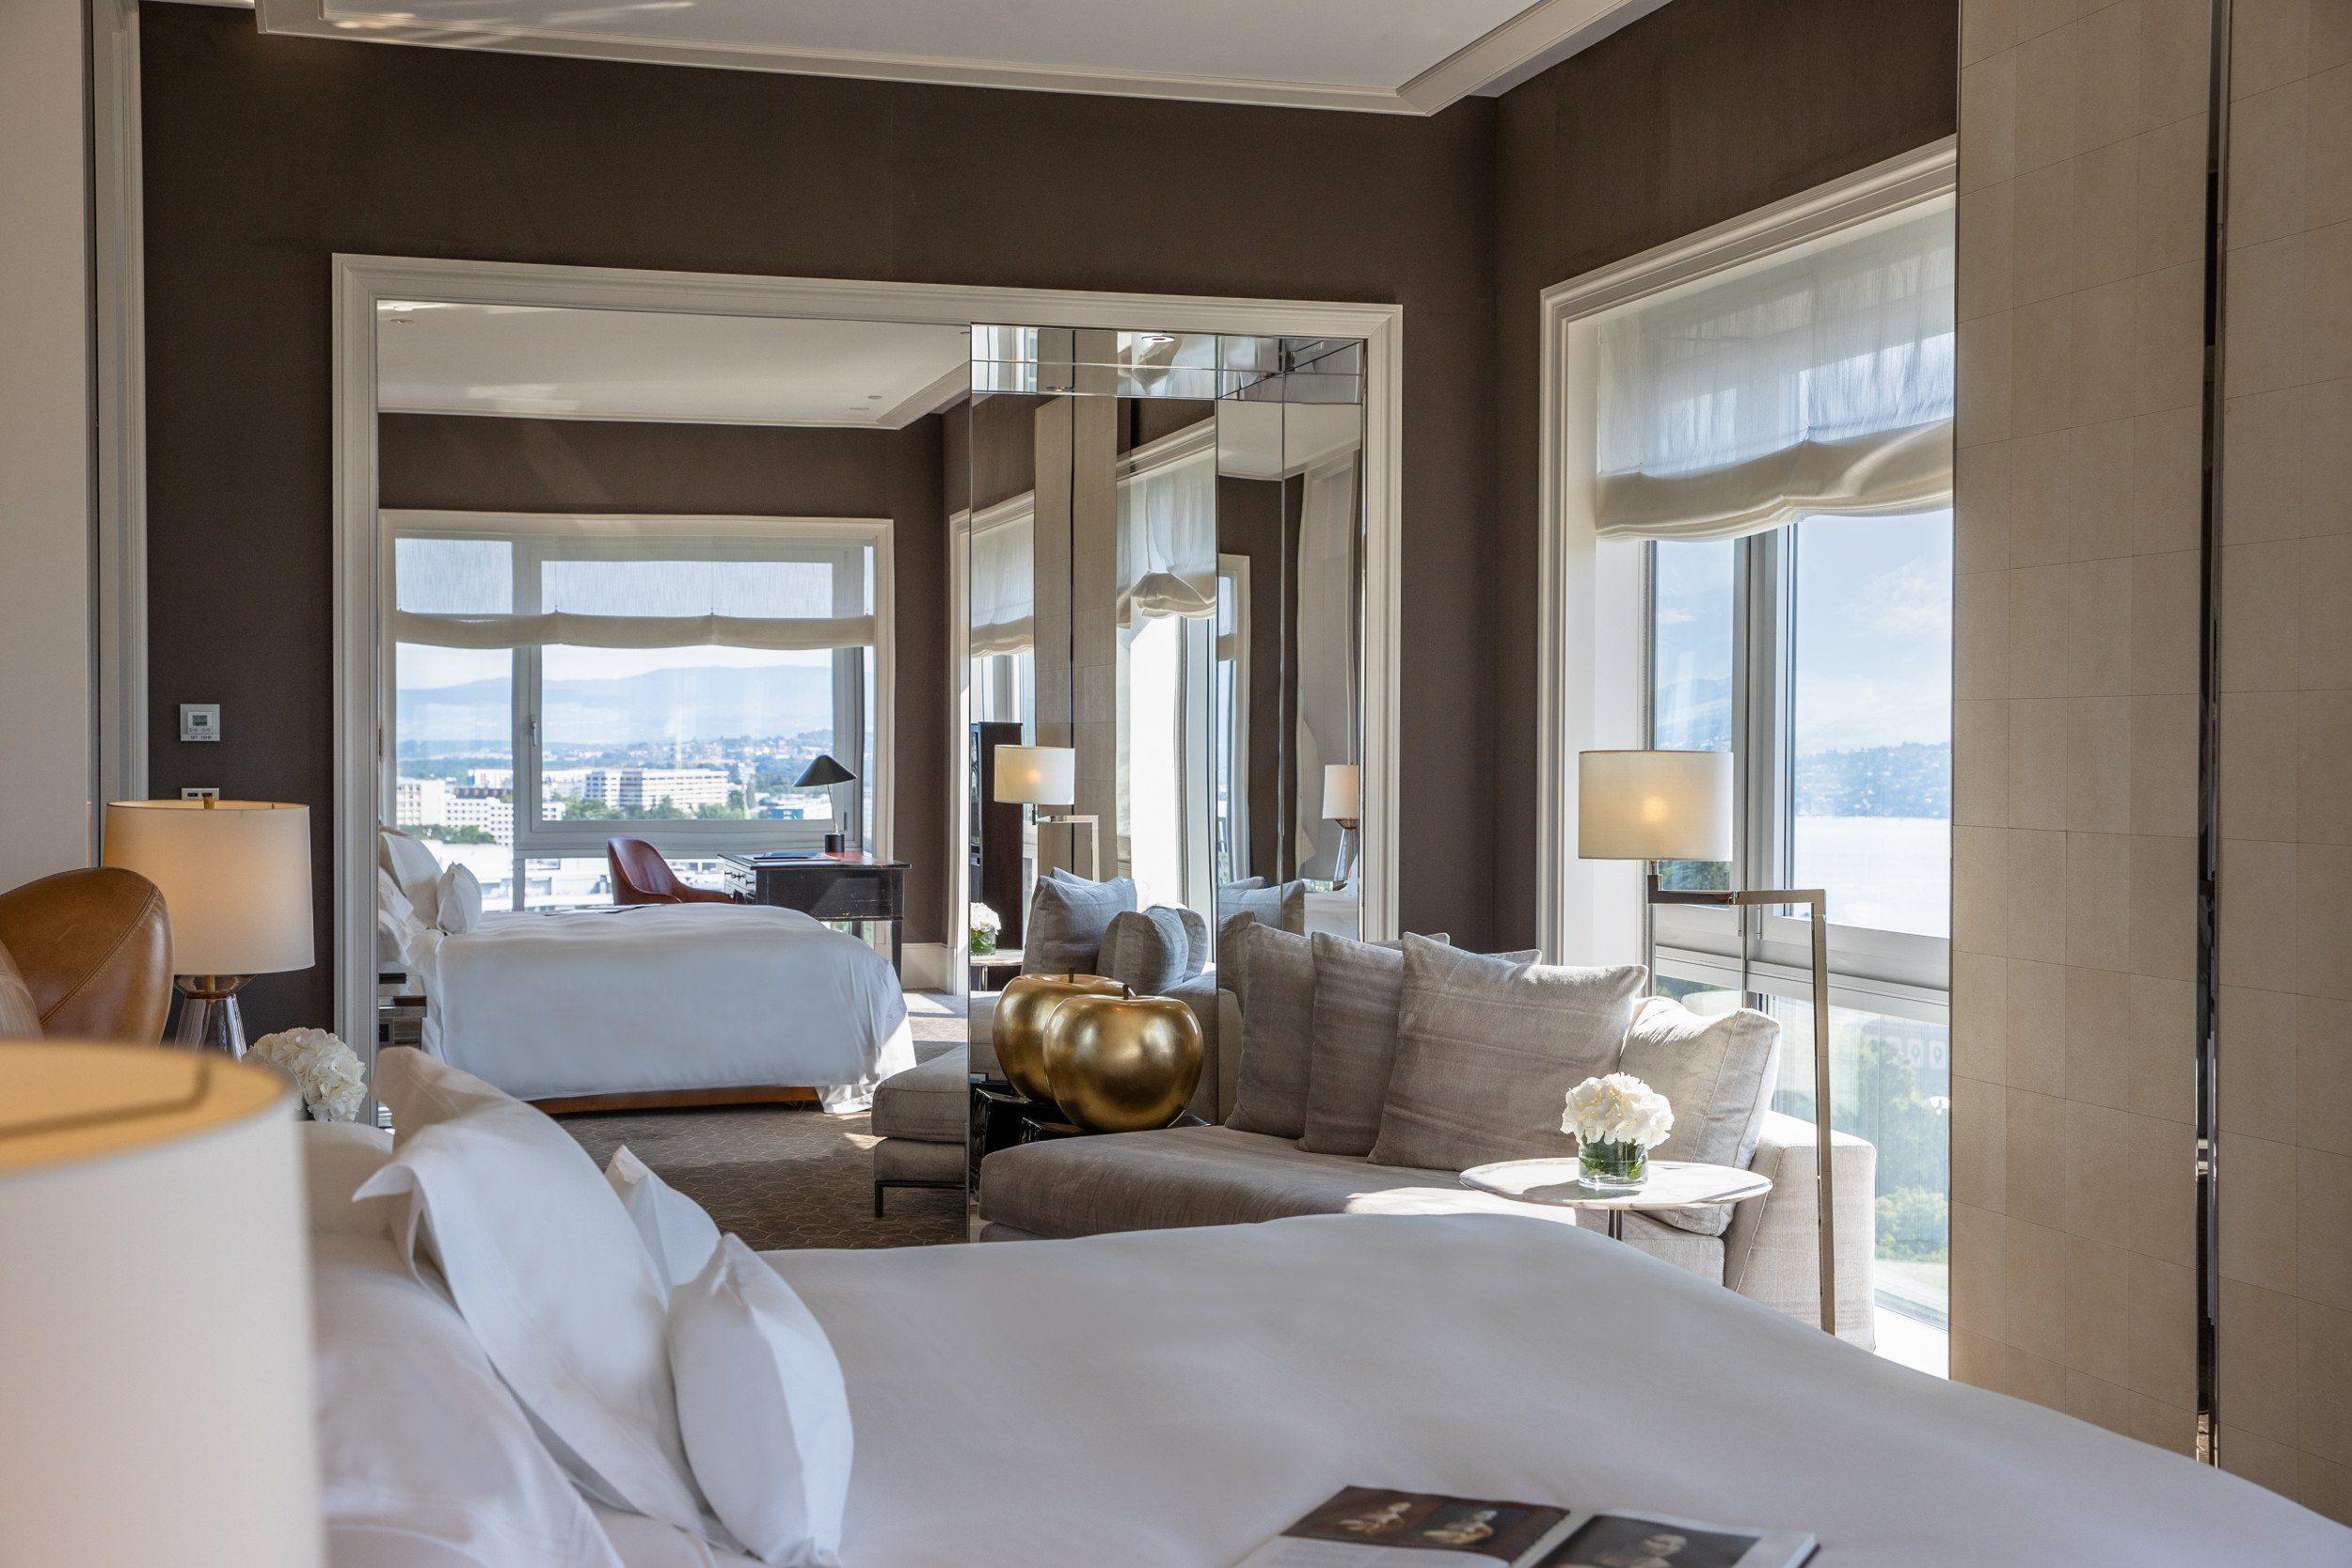 InterContinental-Geneva-Hotel-Imperial-residence